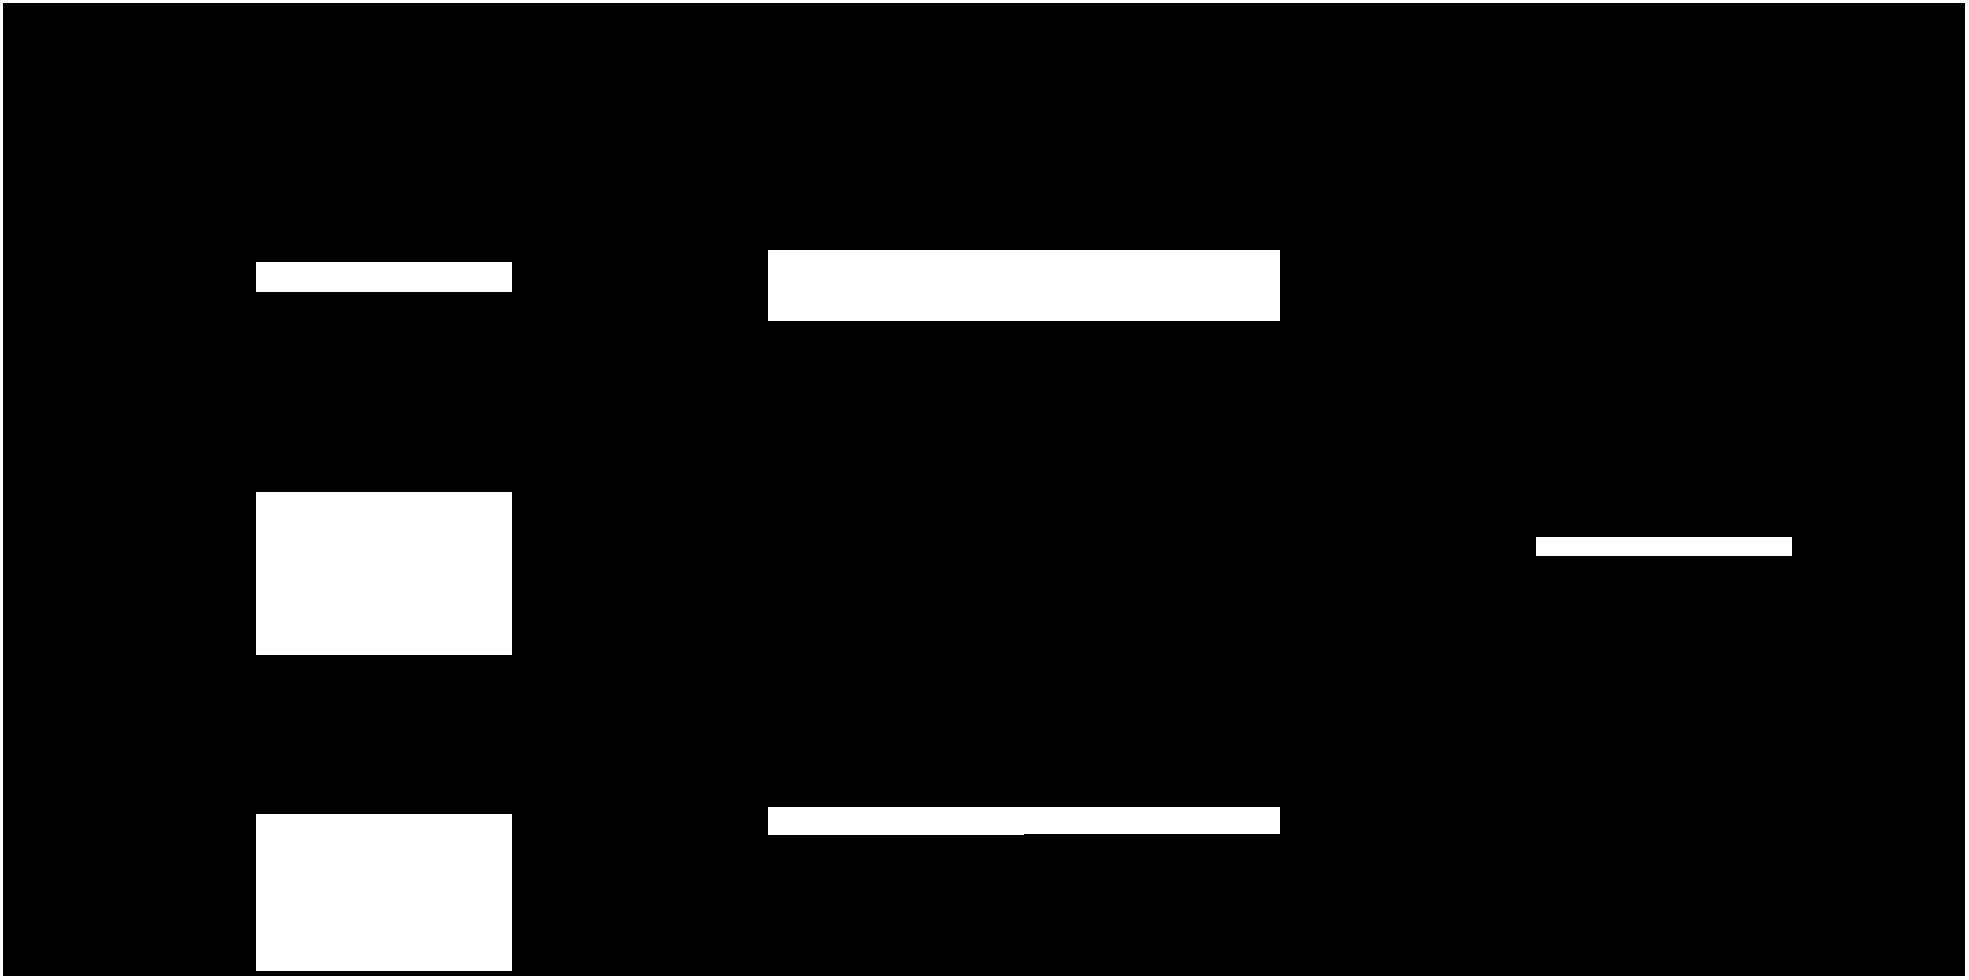 stamtavla keaton